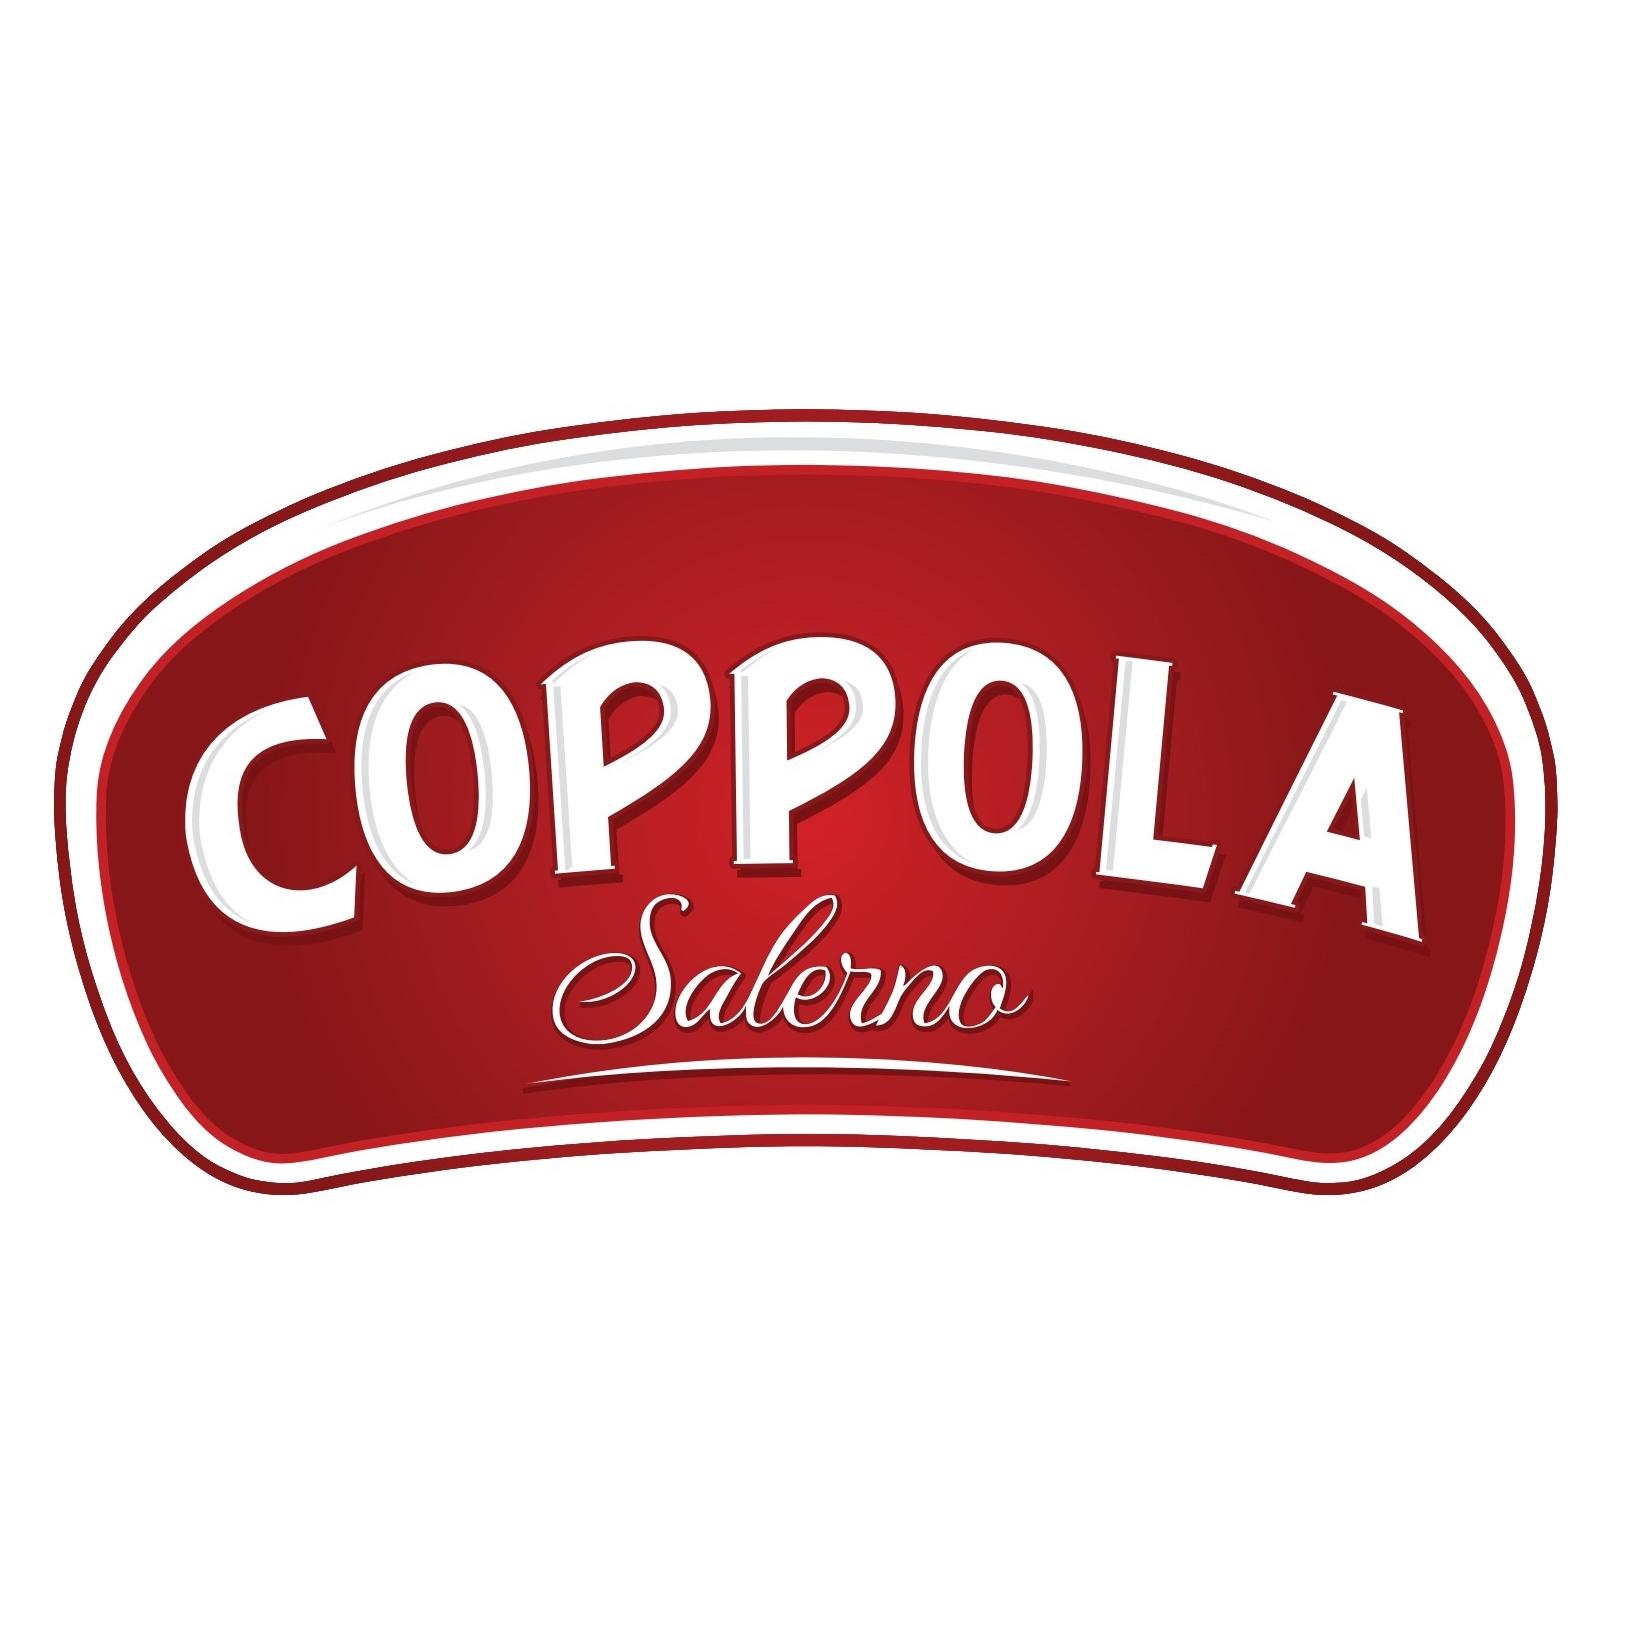 Coppola Pesto Genovese Pasta sauce, Italy, condiment, Coppola Foods